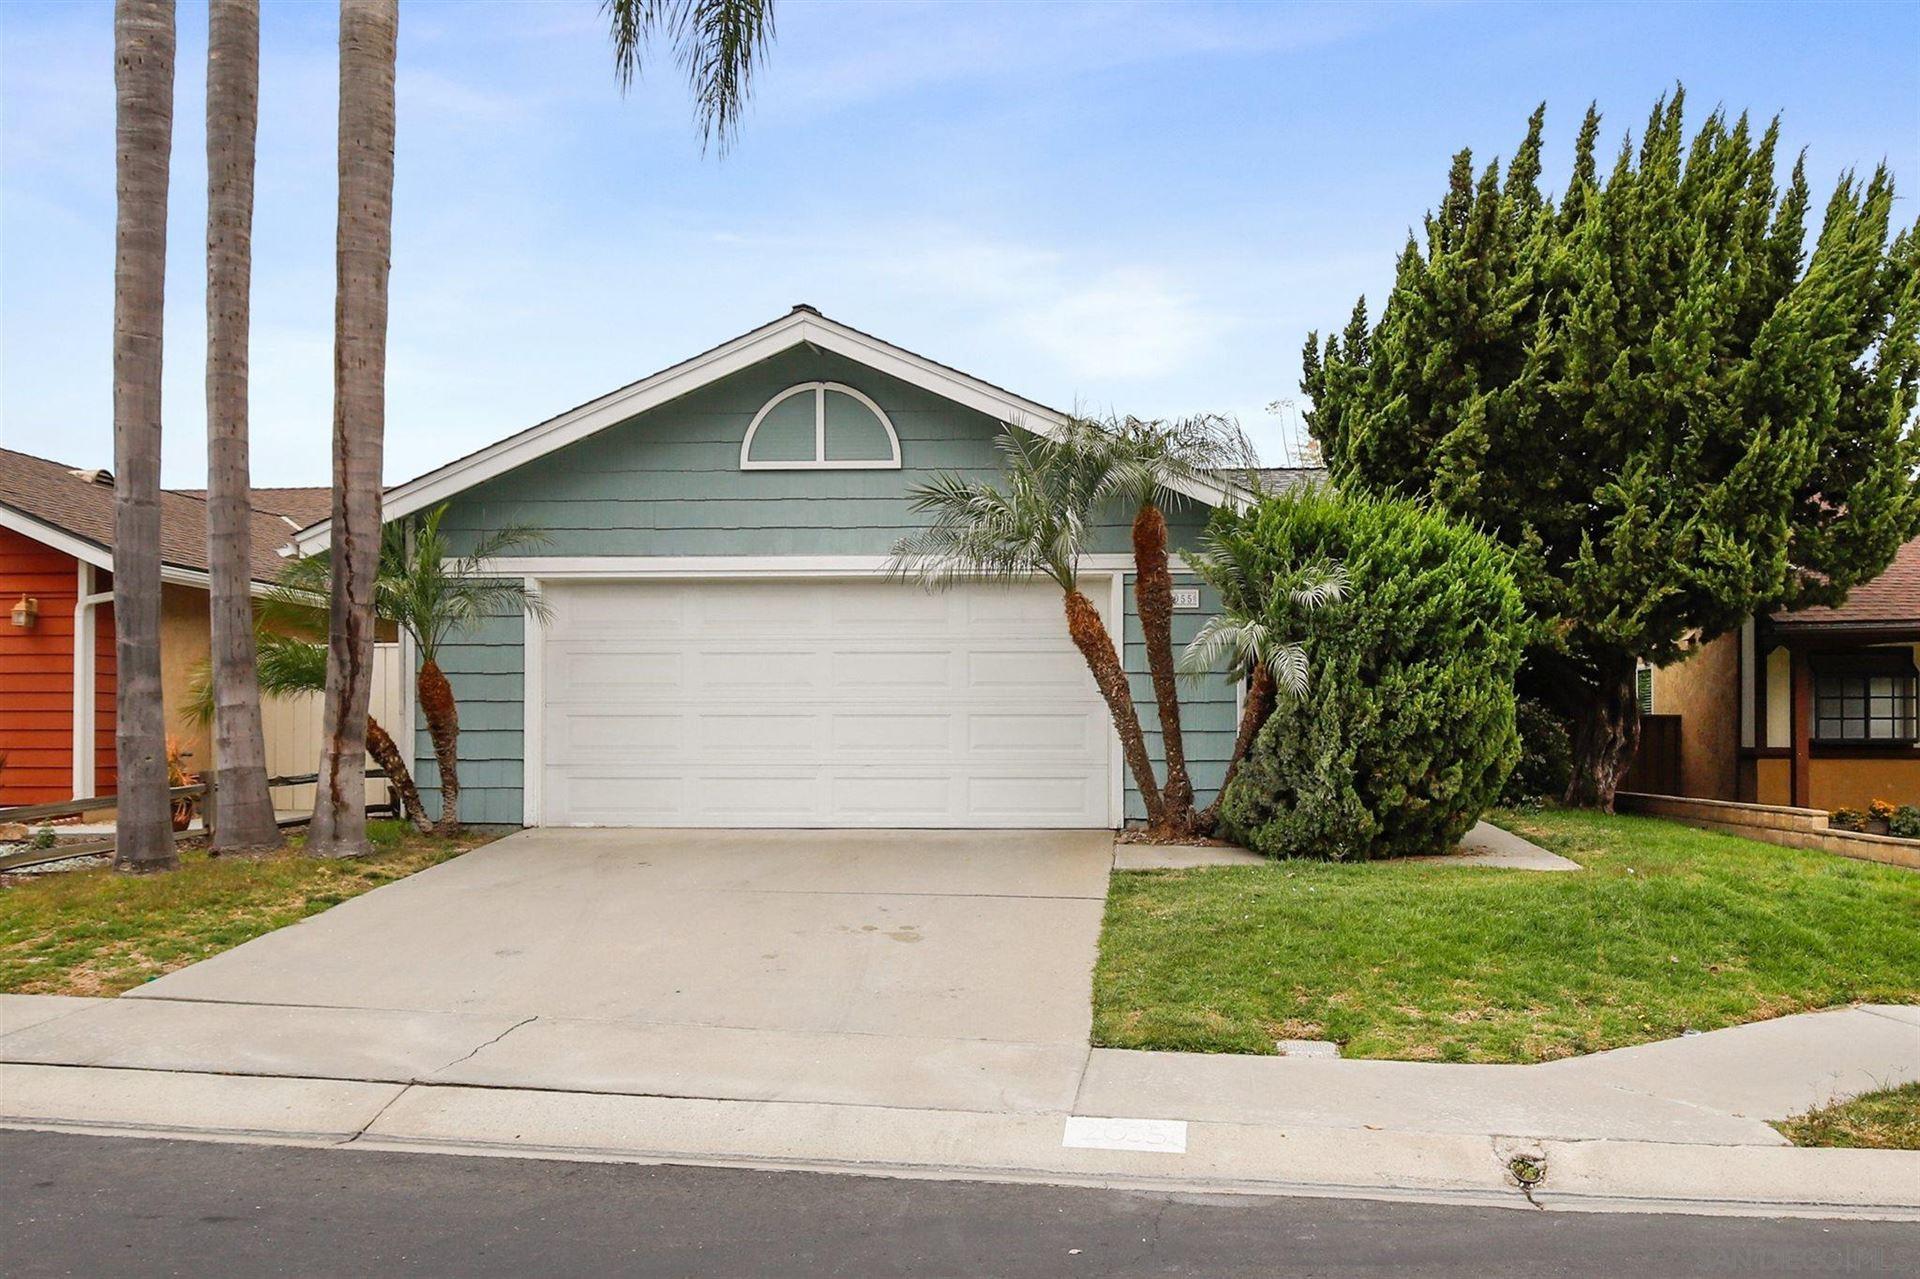 Photo of 2055 Cottage Way, Vista, CA 92081 (MLS # 210009546)